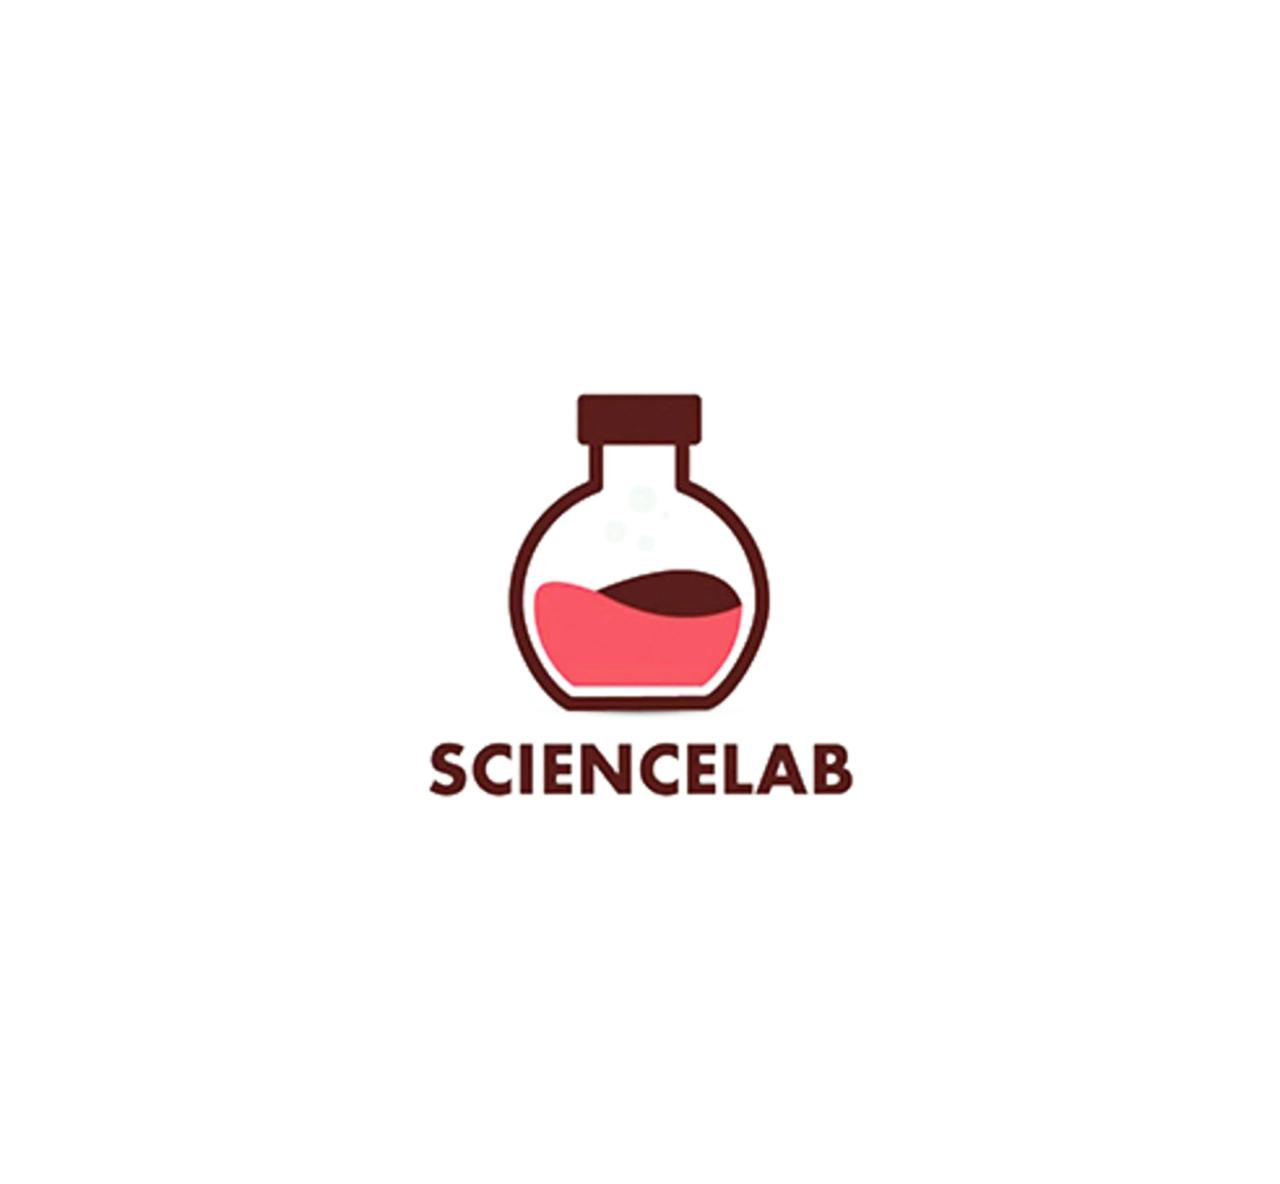 logo science lab edited